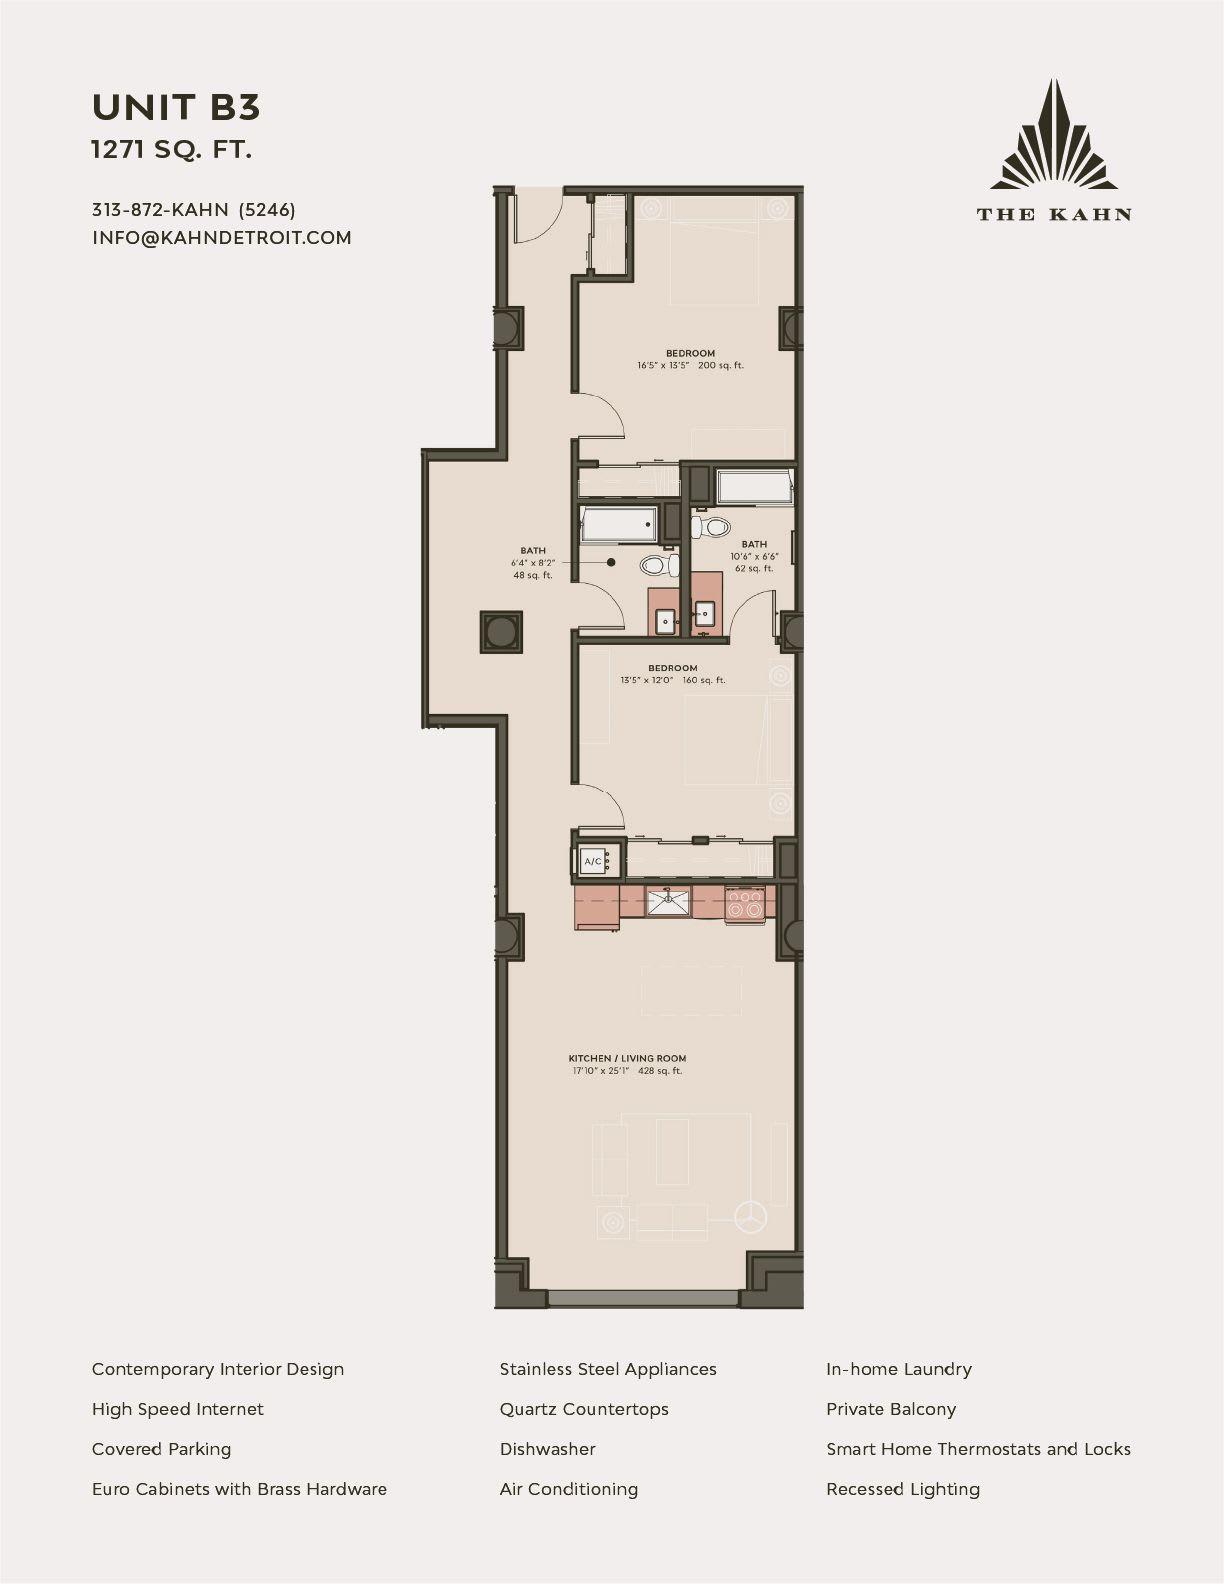 B3 floor plan image at The Kahn in Detroit, Michigan